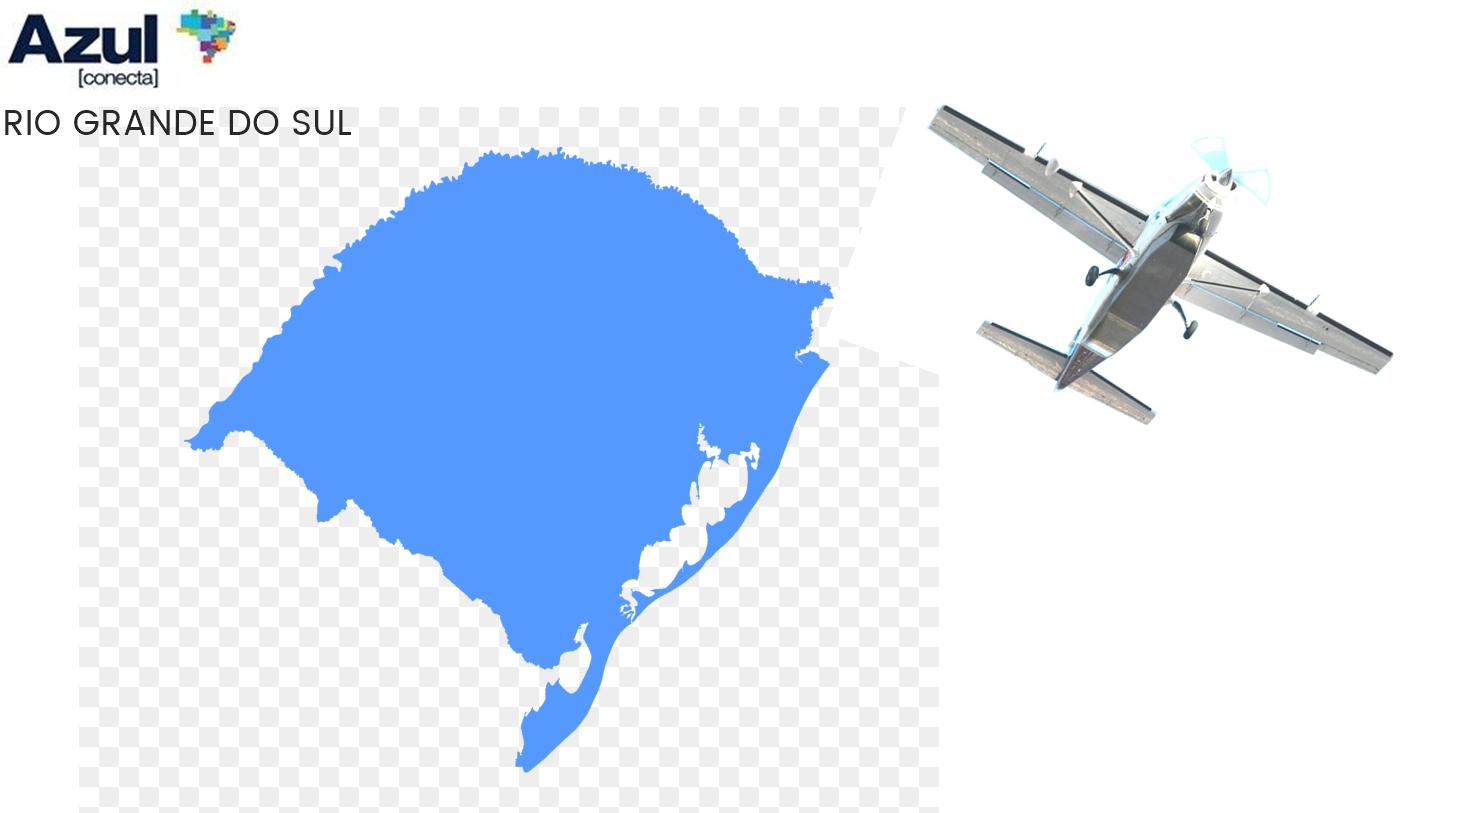 Azul Conecta_Rio Grande do Sul